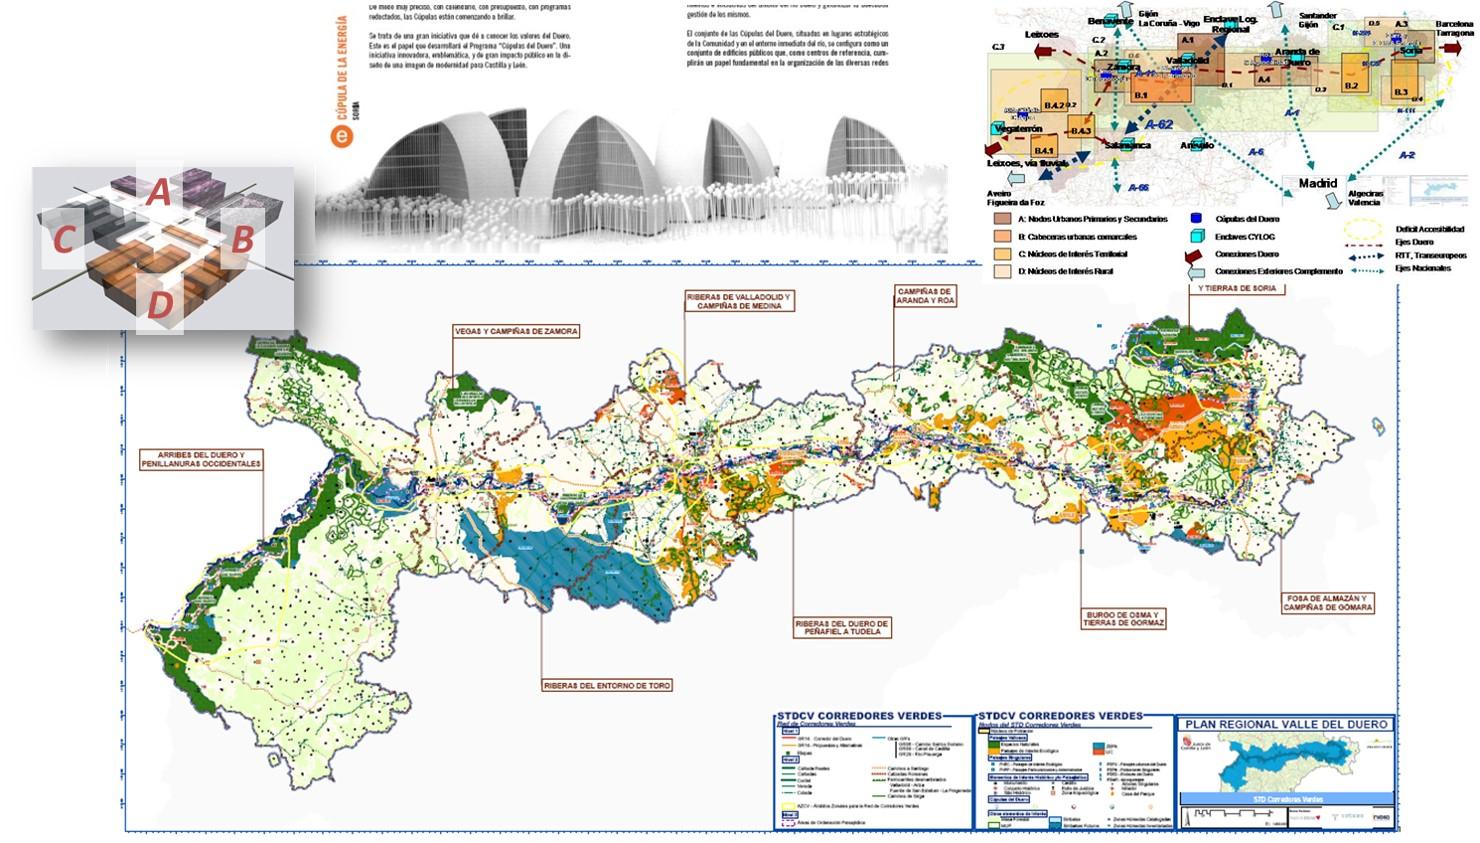 Plan Regional Valle del Duero